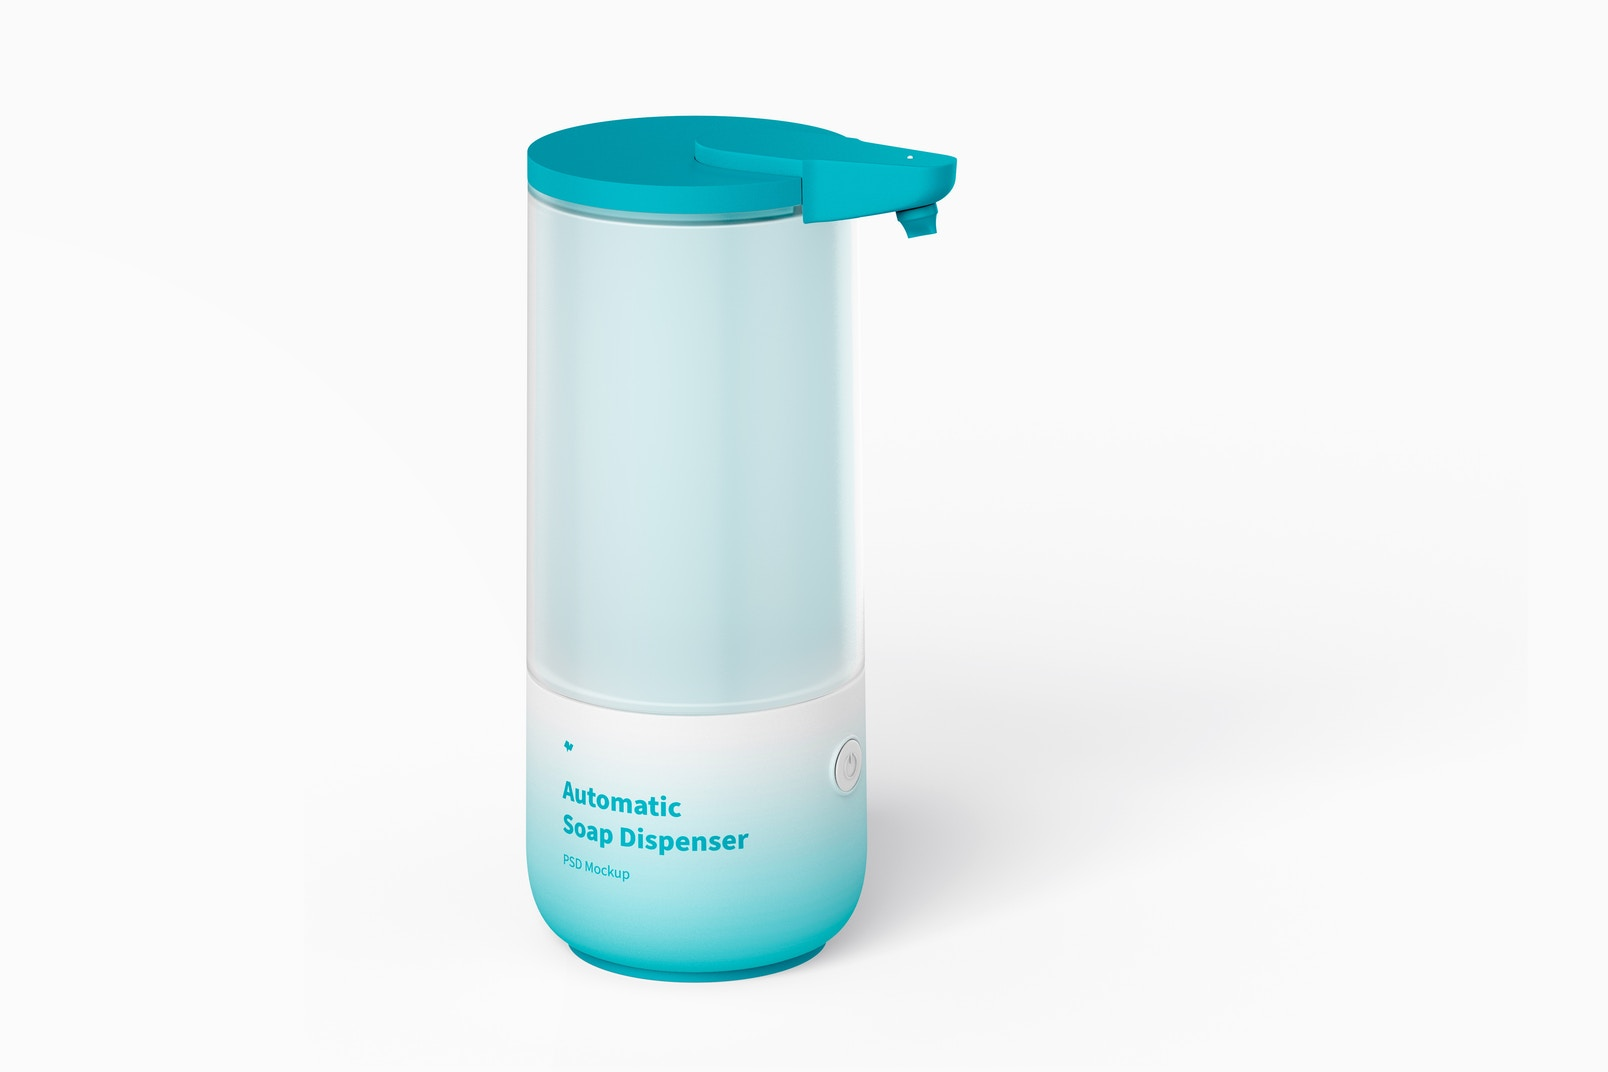 Automatic Soap Dispenser Mockup